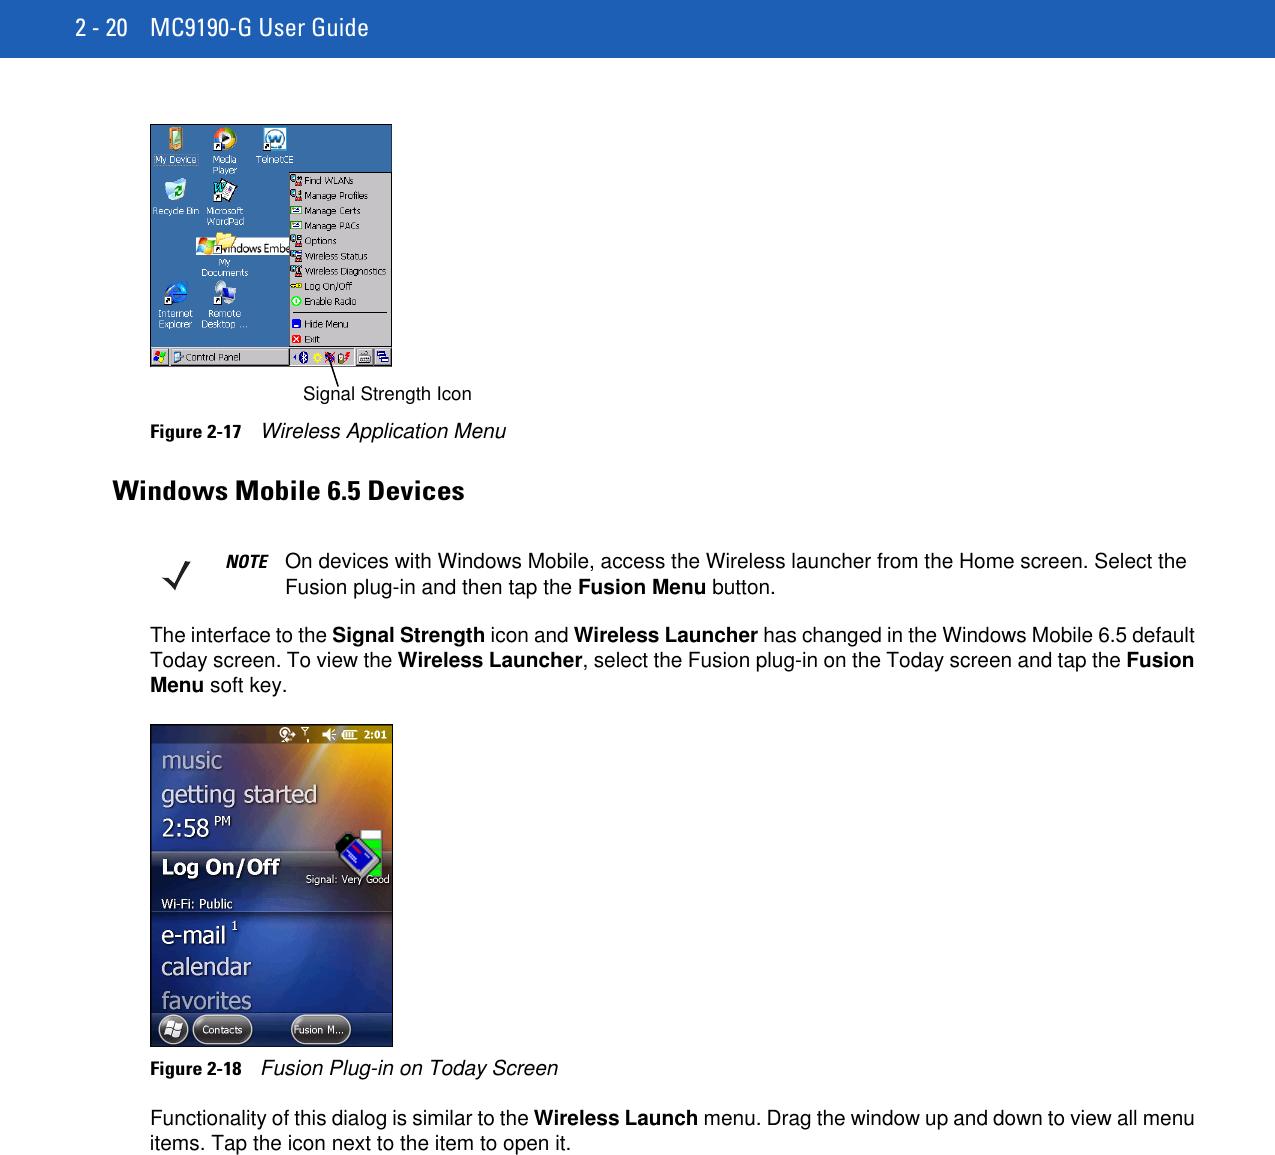 MC9190 G User Guide {English] (P/N 72E 140936 01 Rev  A